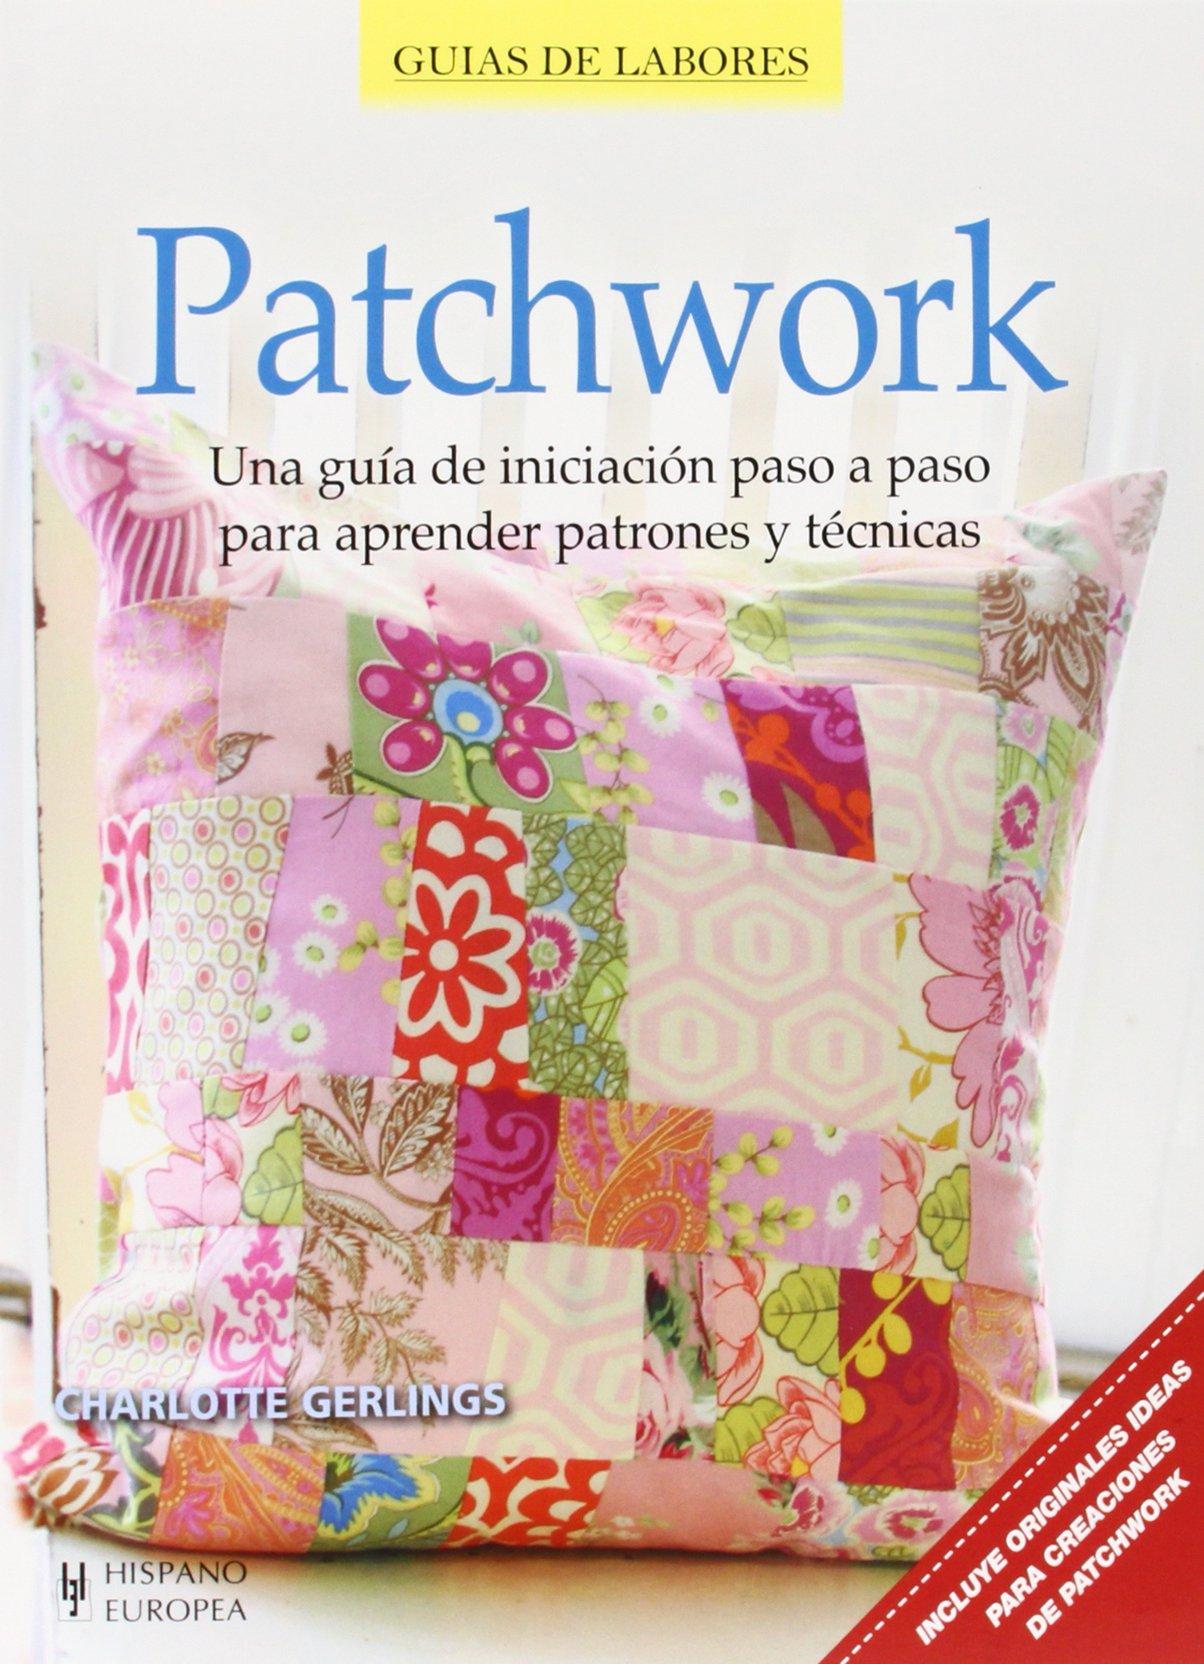 Patchwork: Charlotte Gerlings: 9788425520877: Amazon.com: Books